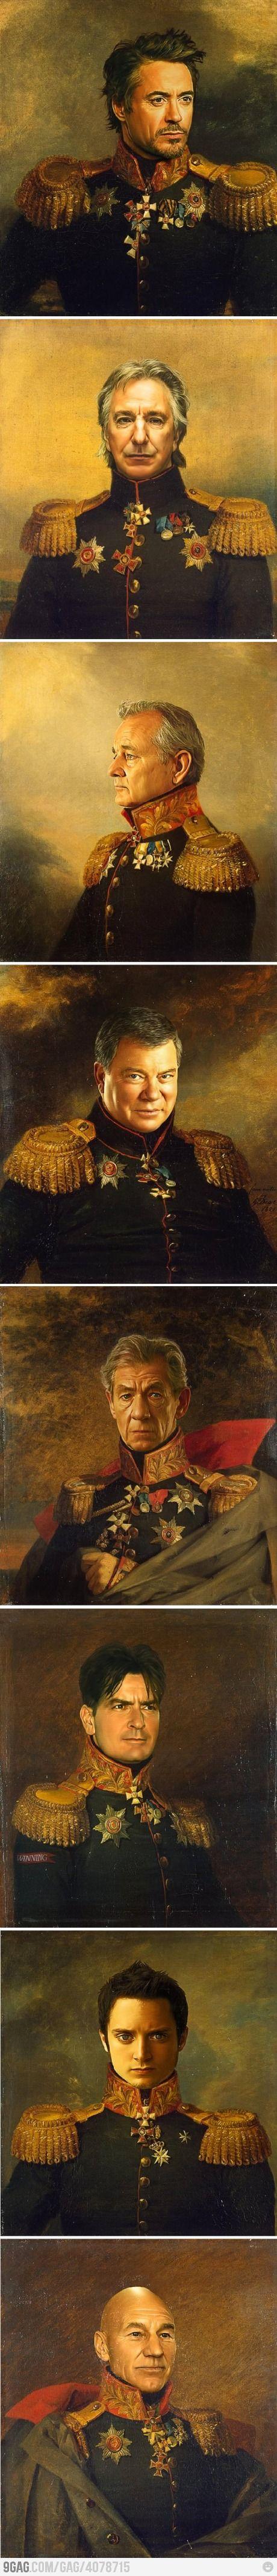 historical figures.